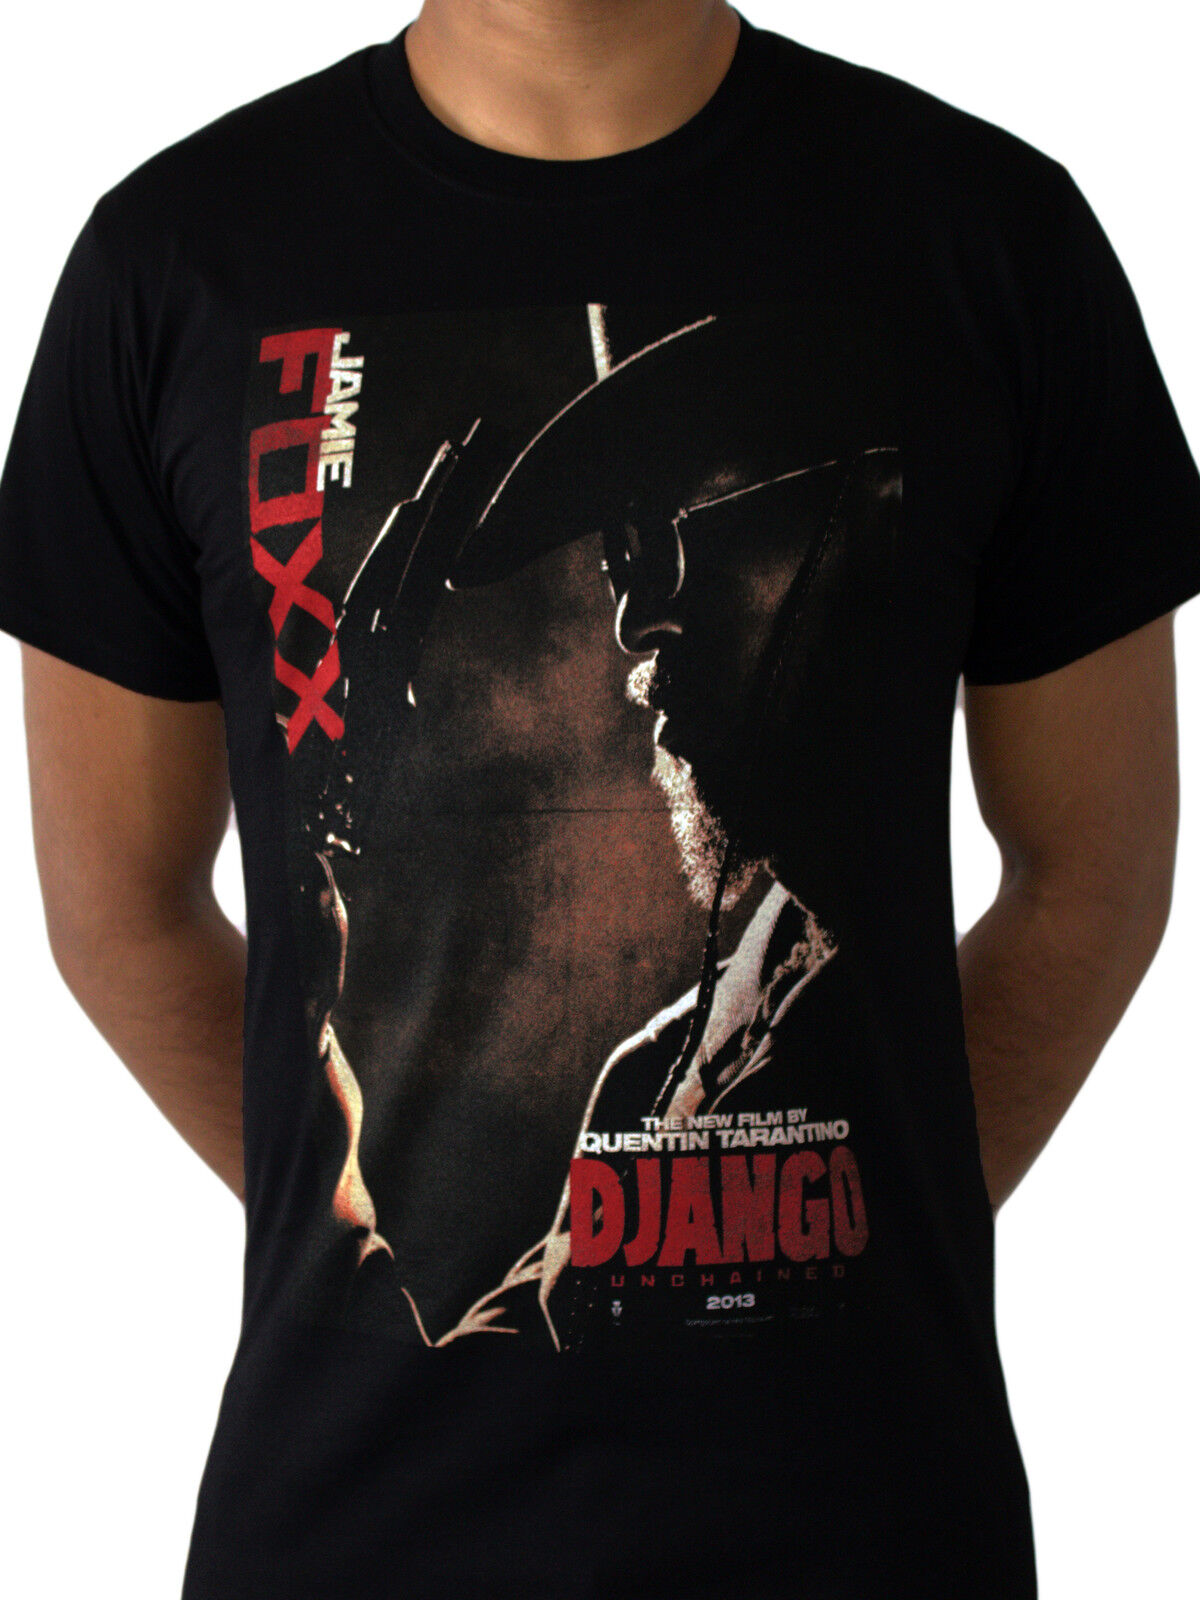 Django Unchained Chain Movie Poster Tarantino Western Cowboy Black Mens T-shirt